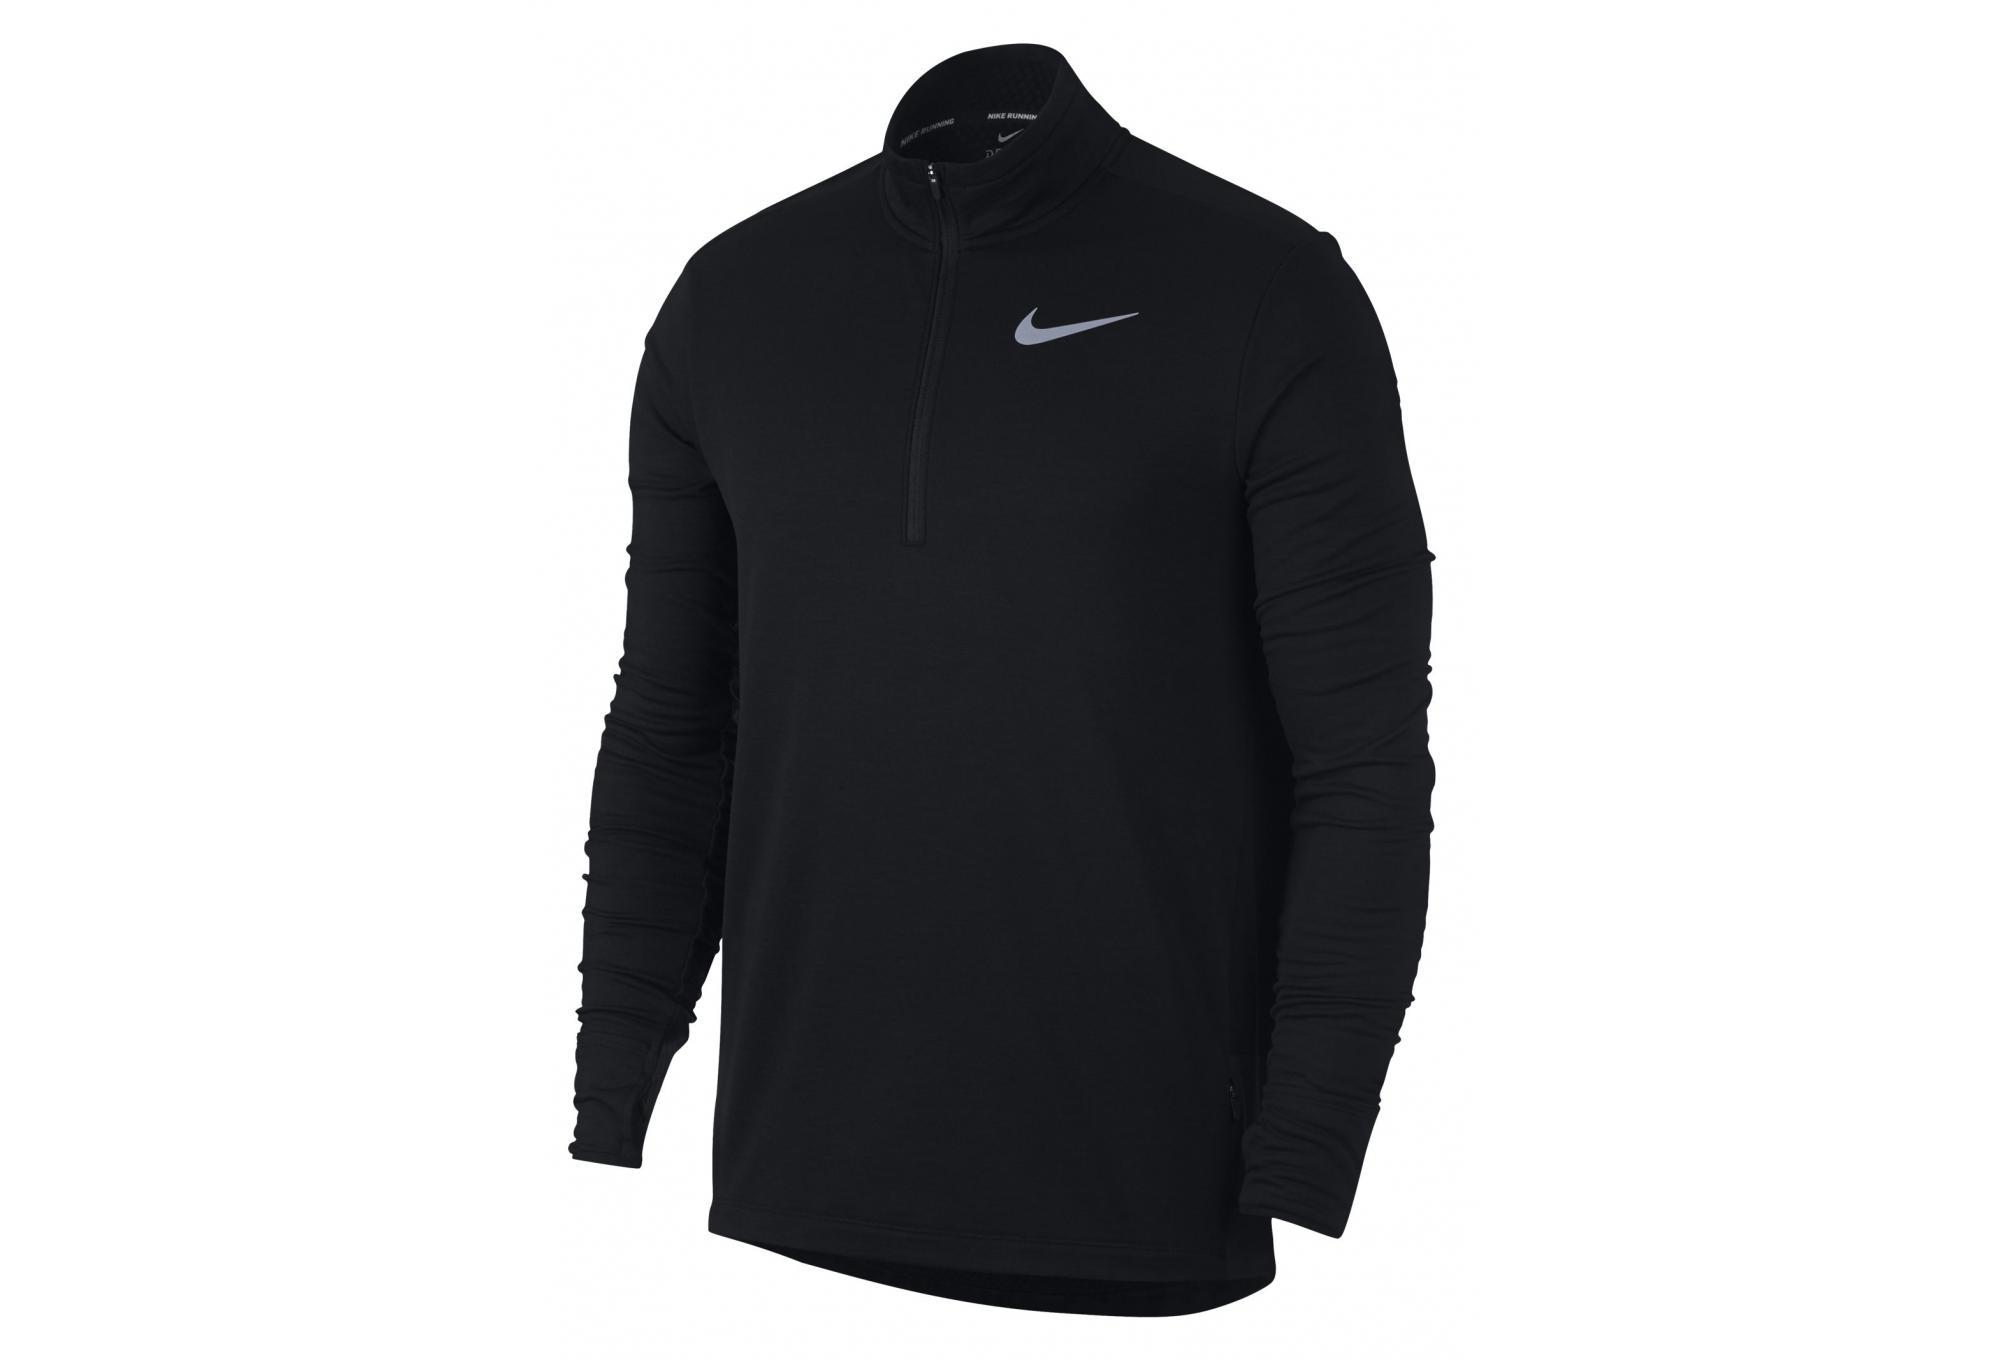 a41118378f0a2 Nike Sphere Element Thermal Zip Long Sleeves Jacket Black ...